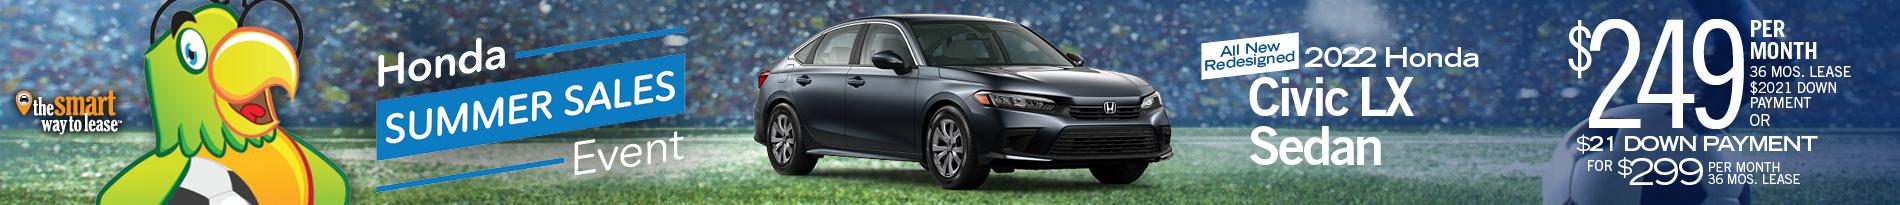 All-New 2022 Redesigned Honda Civic LX Sedan